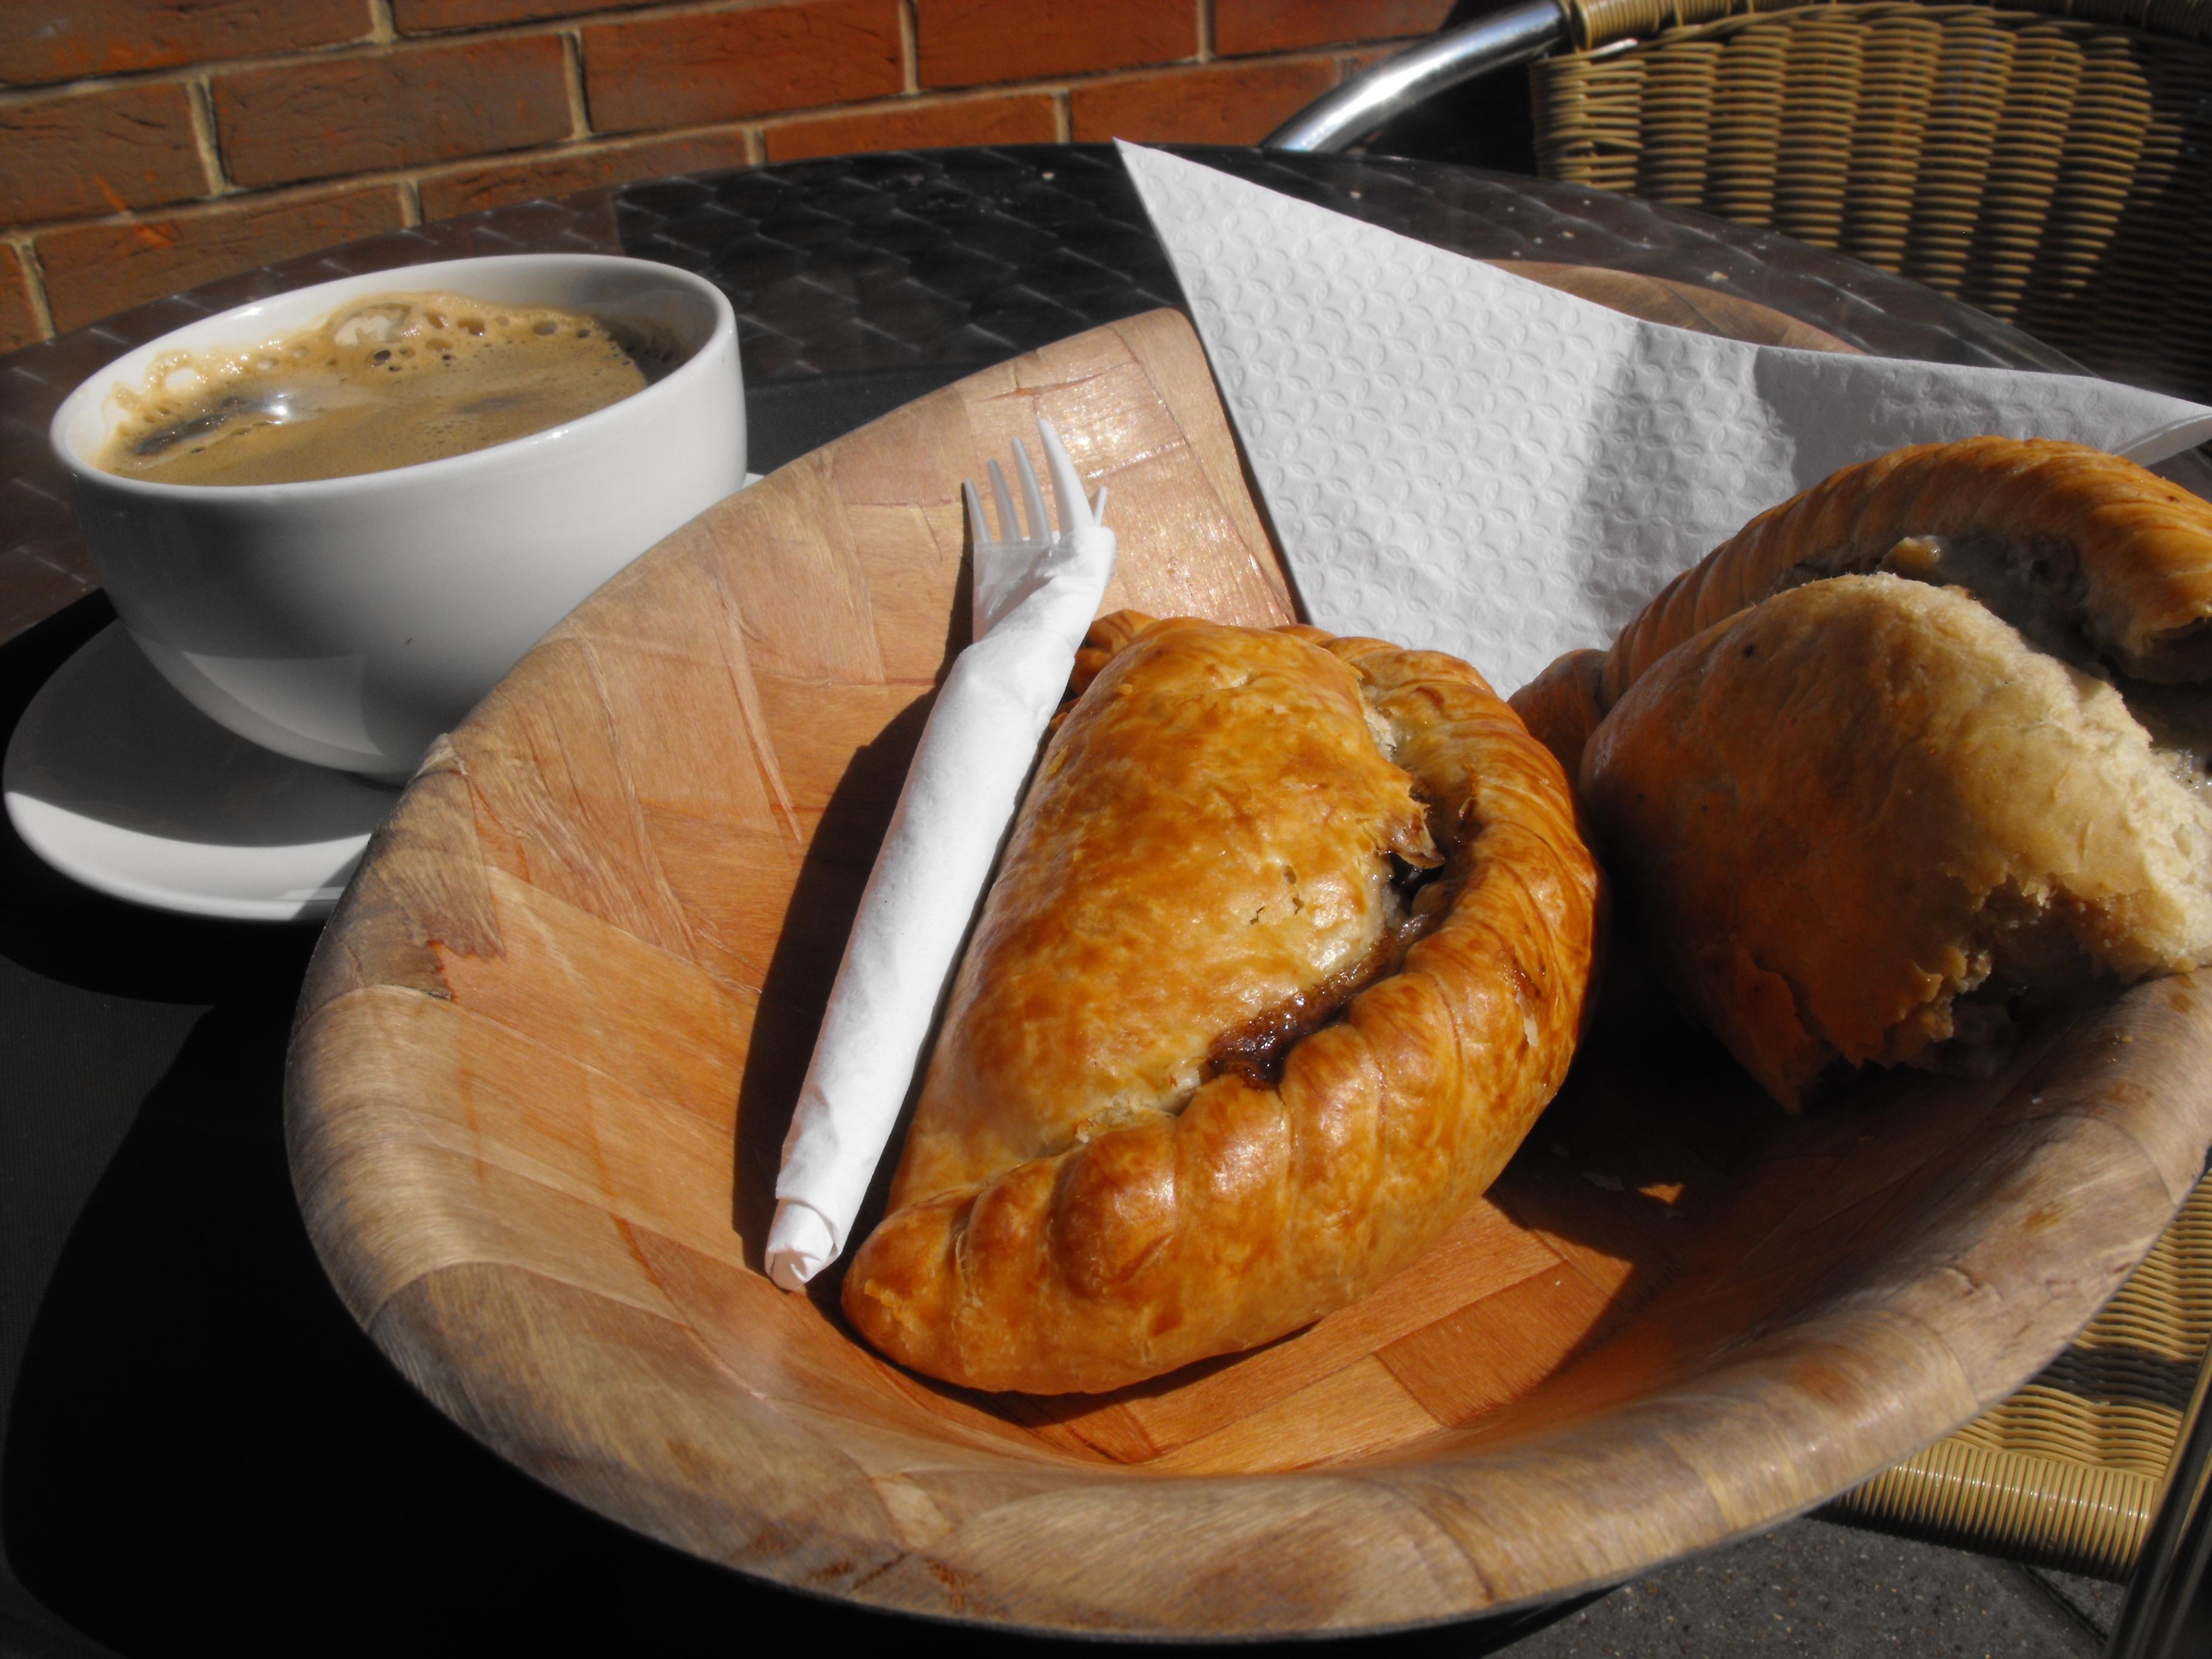 Michigan Cuisine: Enter the Pasty